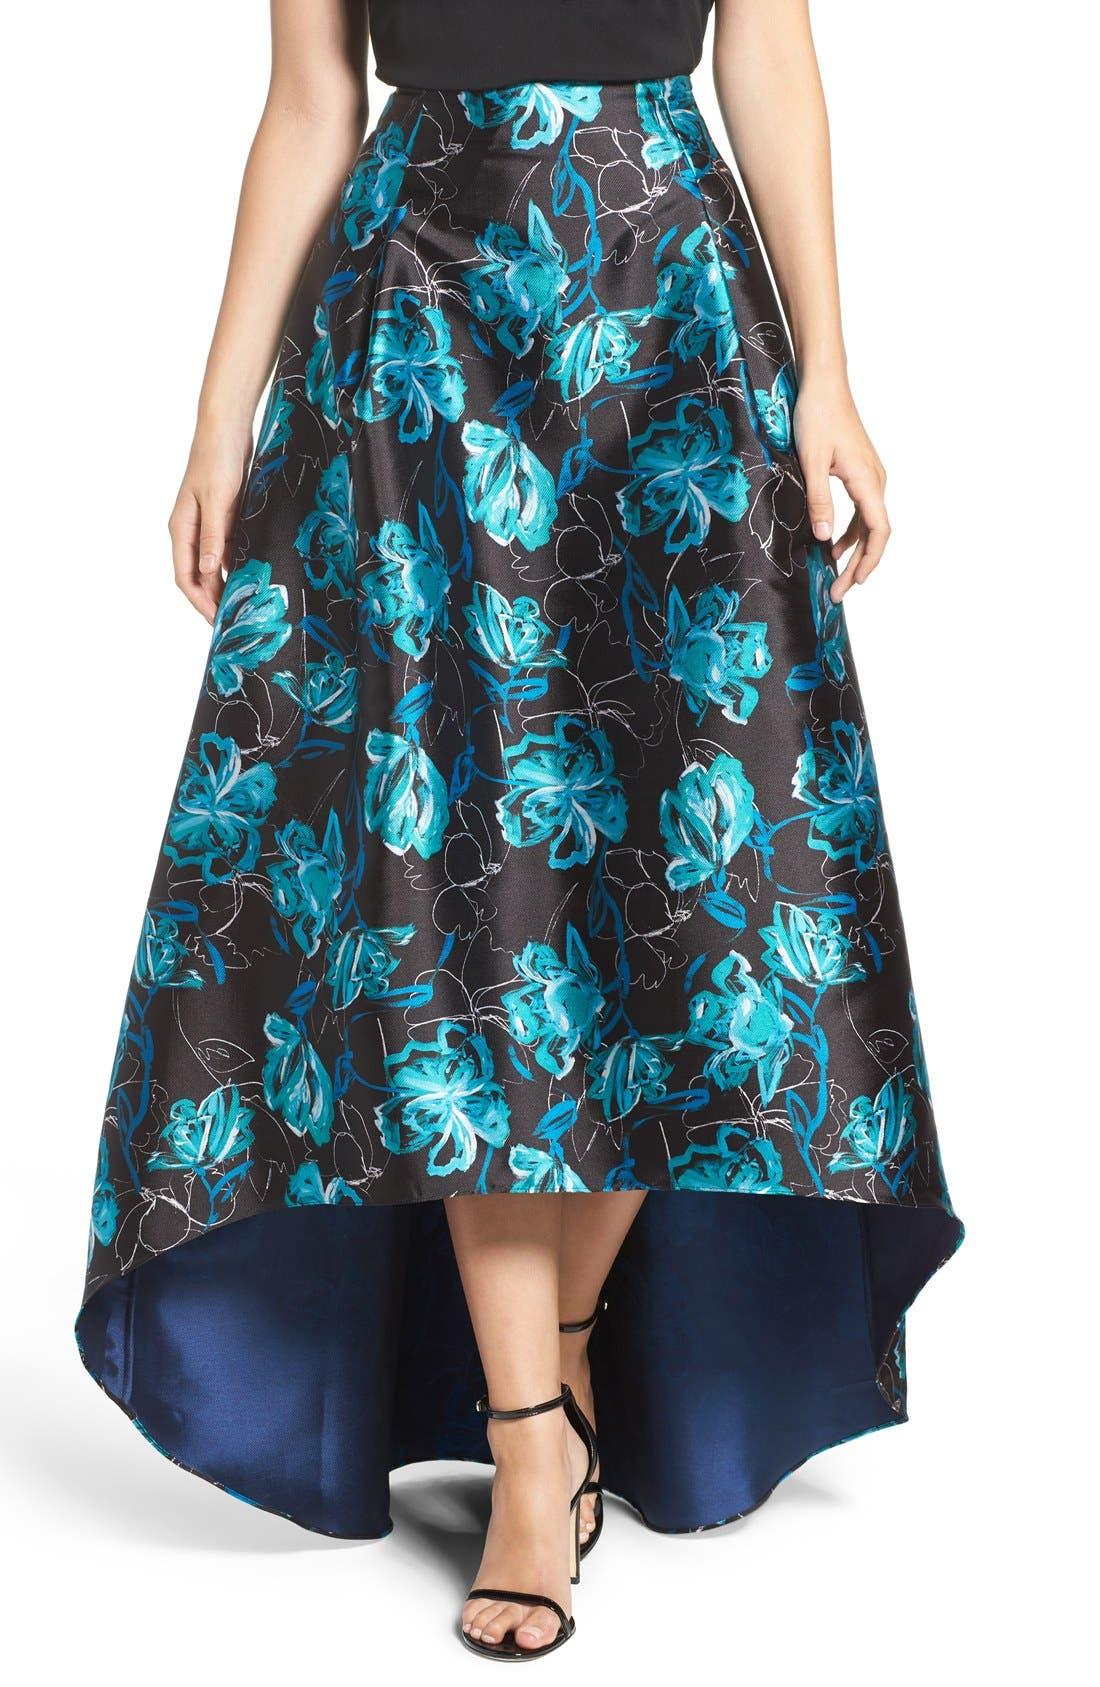 Alternate Image 1 Selected - Sachin & Babi Noir 'Avalon' High/Low Jacquard Ball Skirt